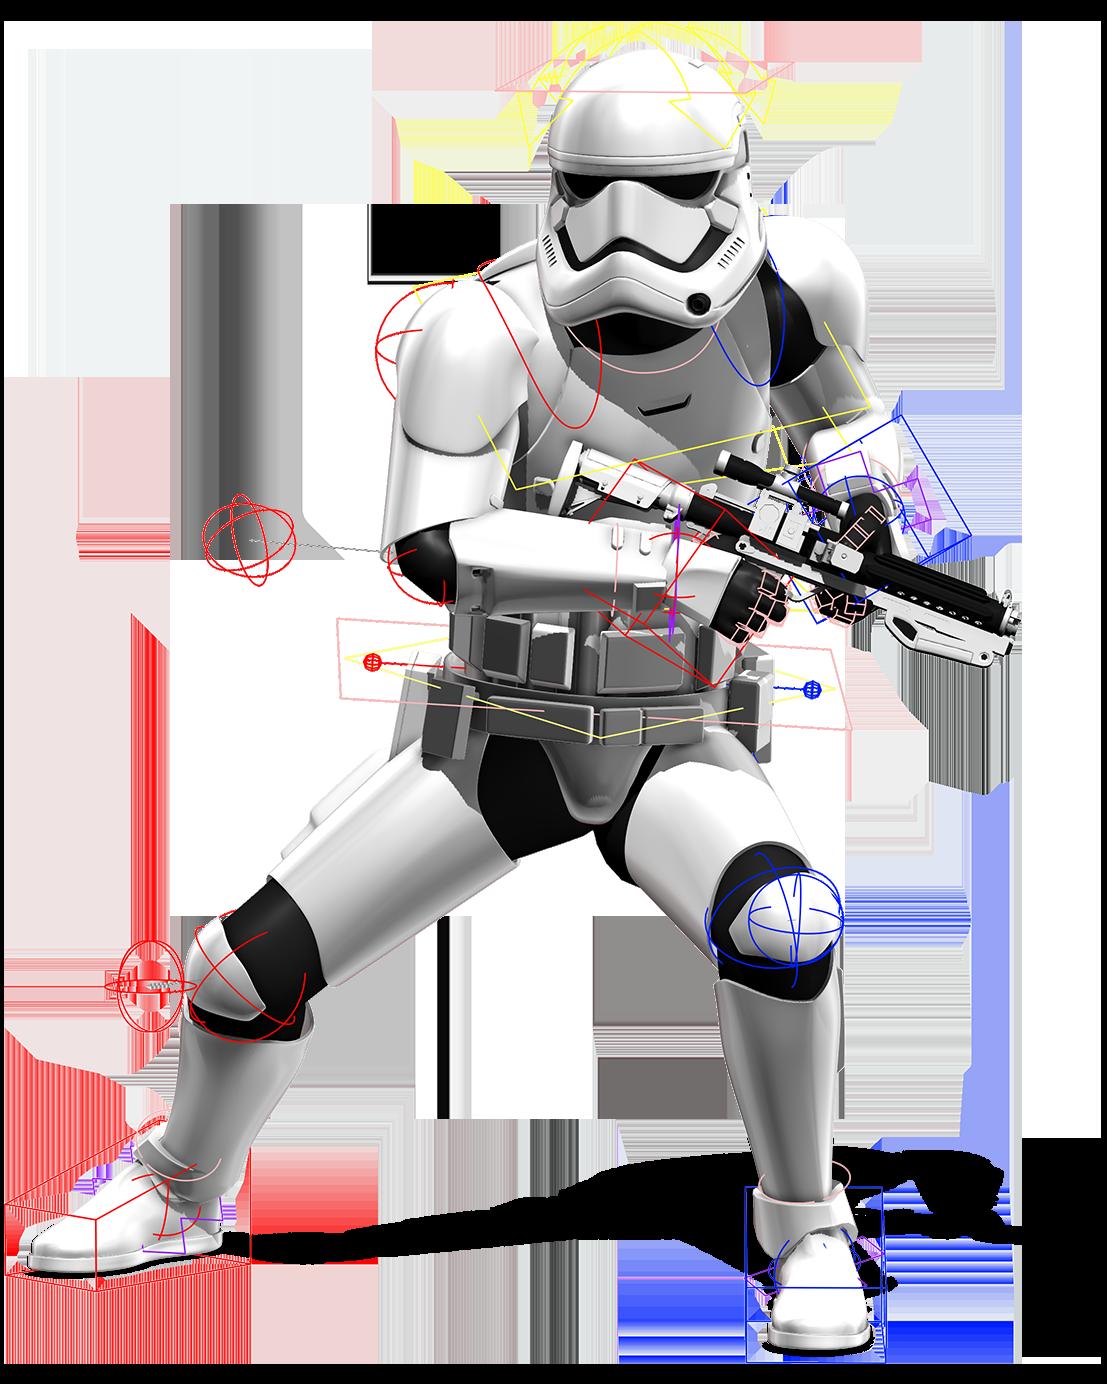 stormtrooper_frontThumbnailTrans